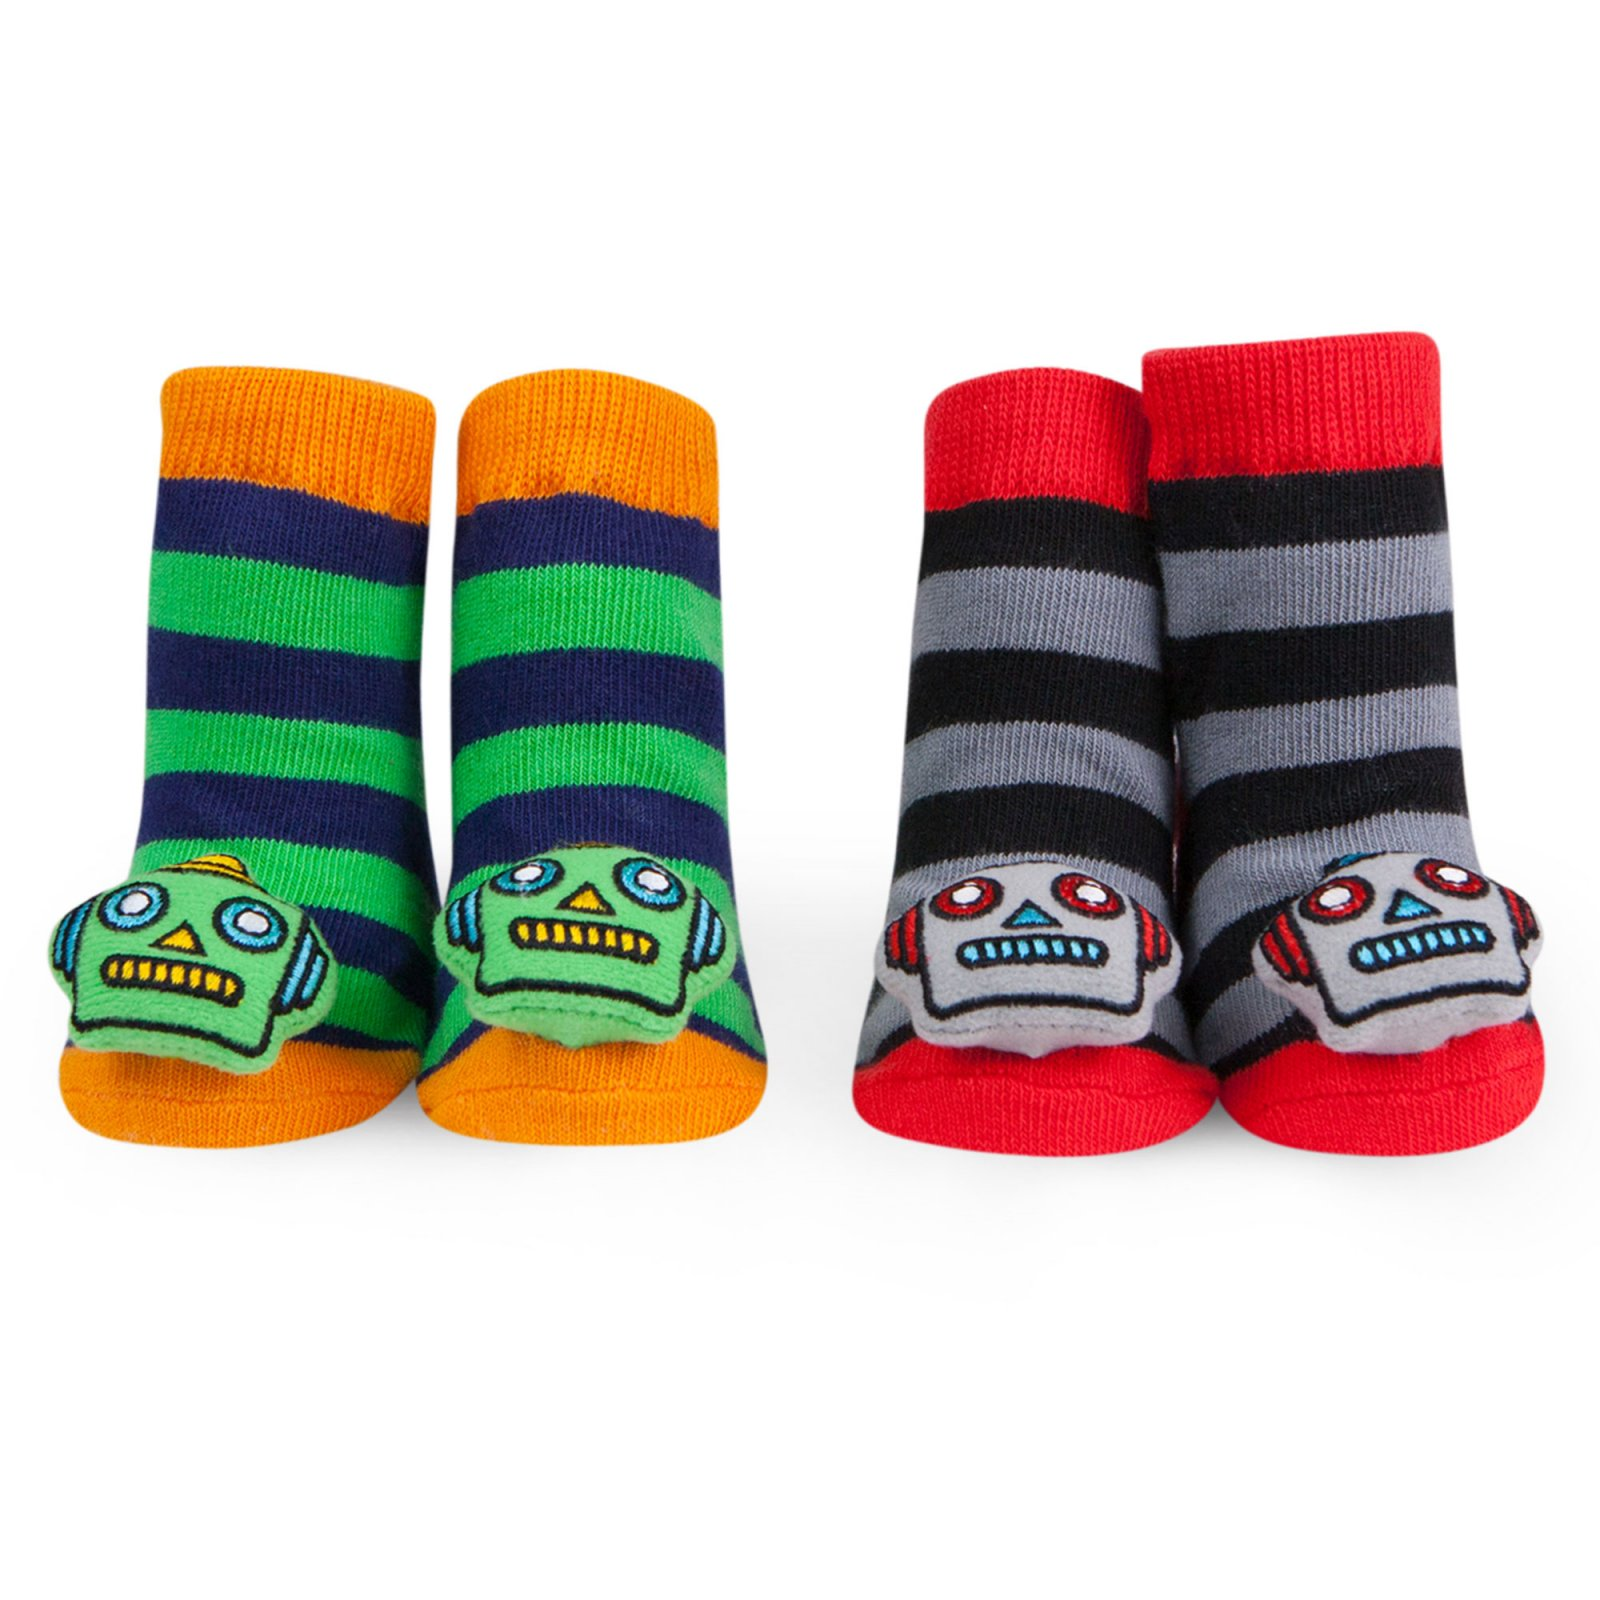 Waddle Rattle Socks Set of 2 Pair